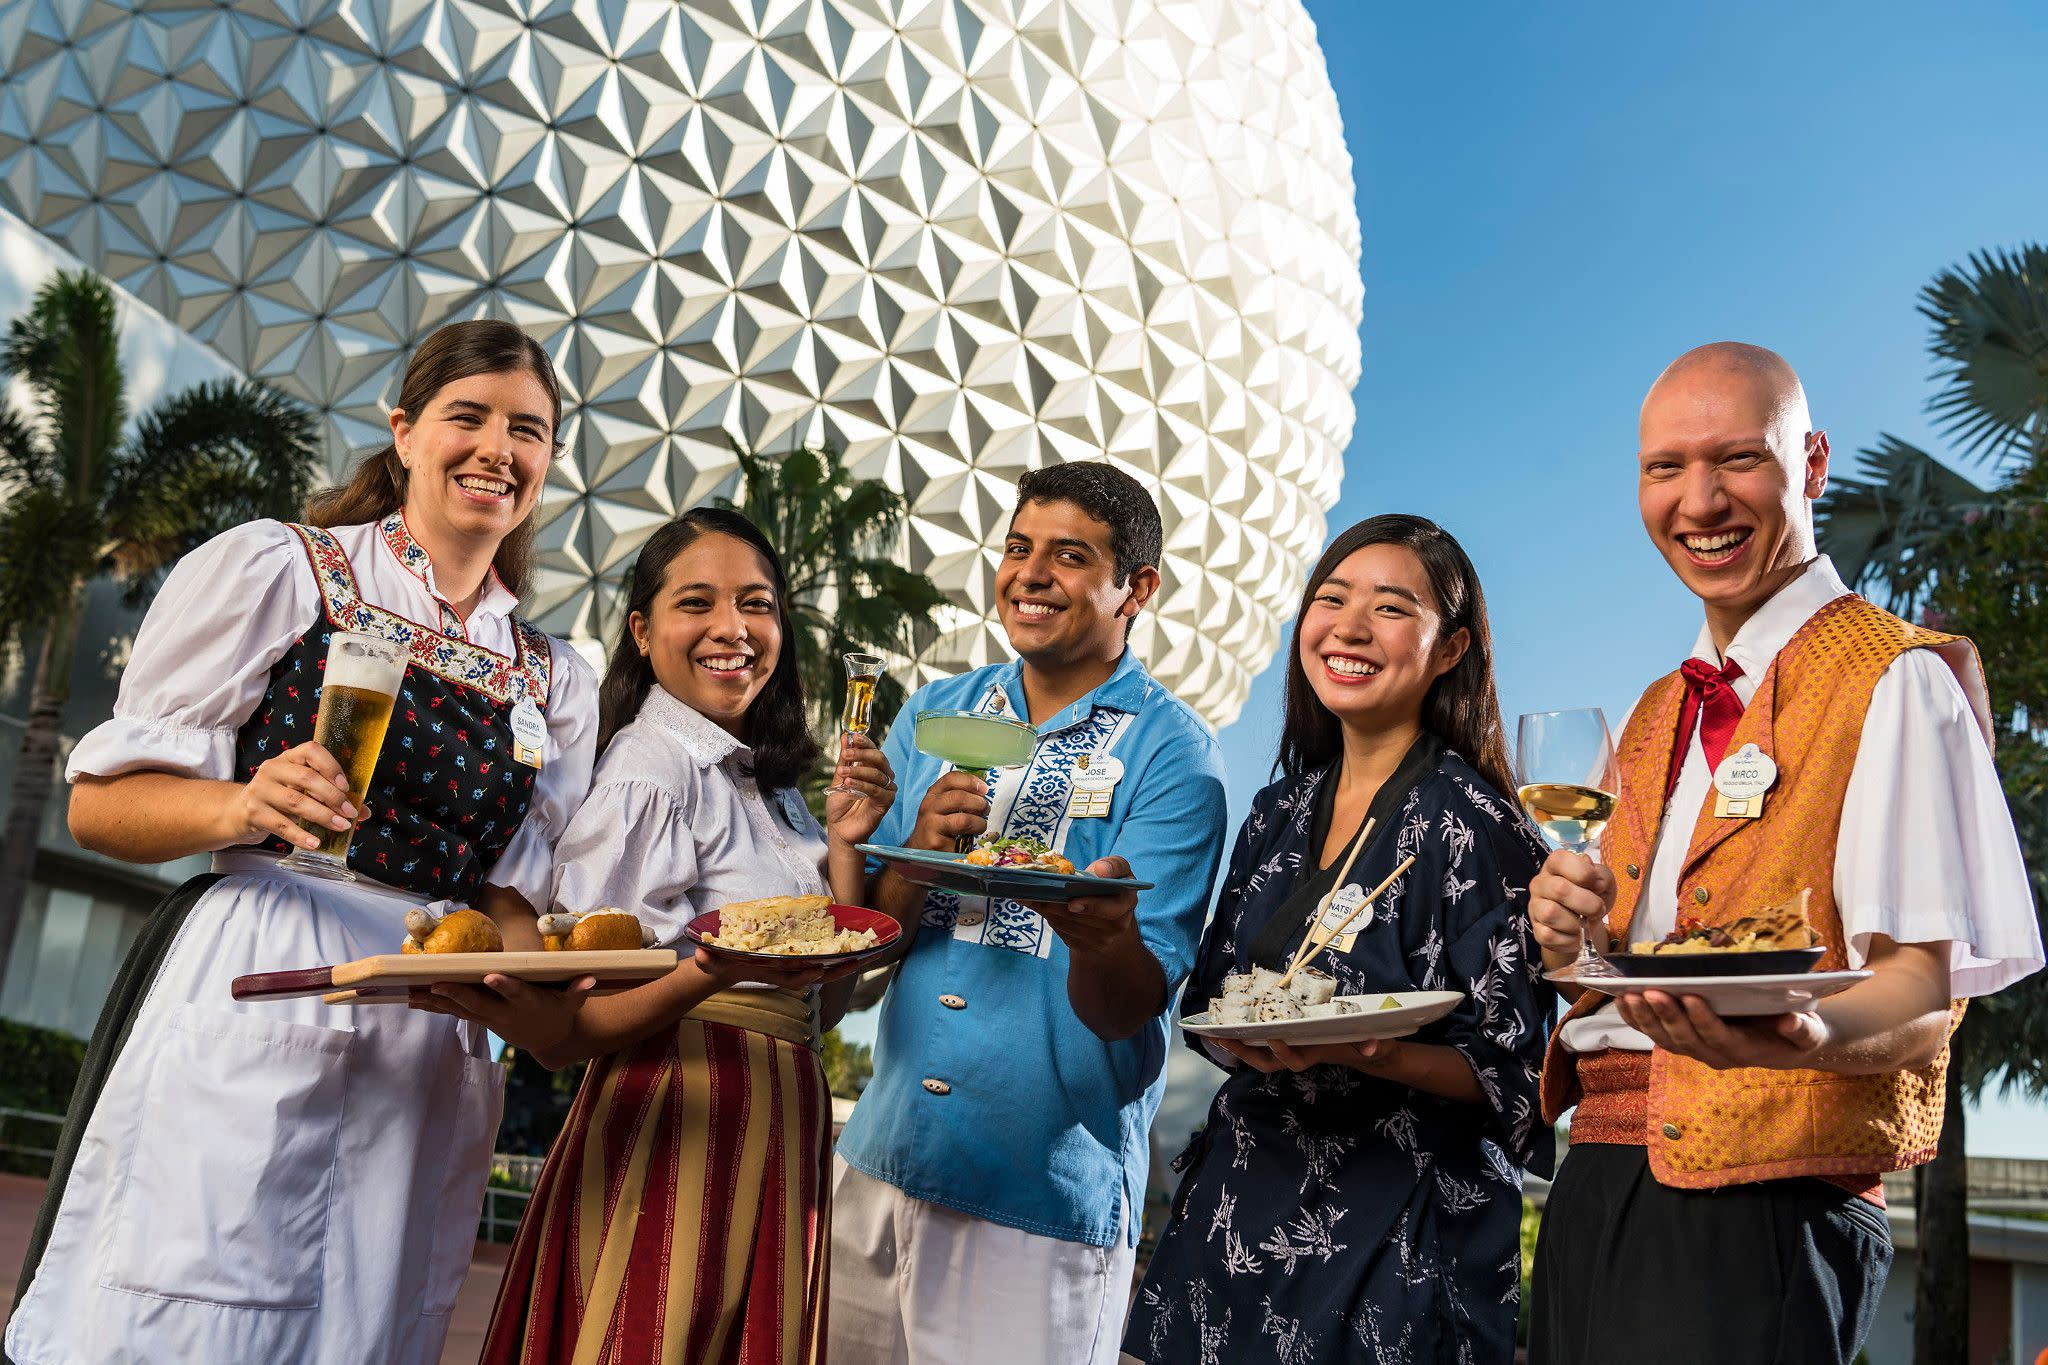 Epcot International Food & Wine Festival at Walt Disney World Resort in Orlando